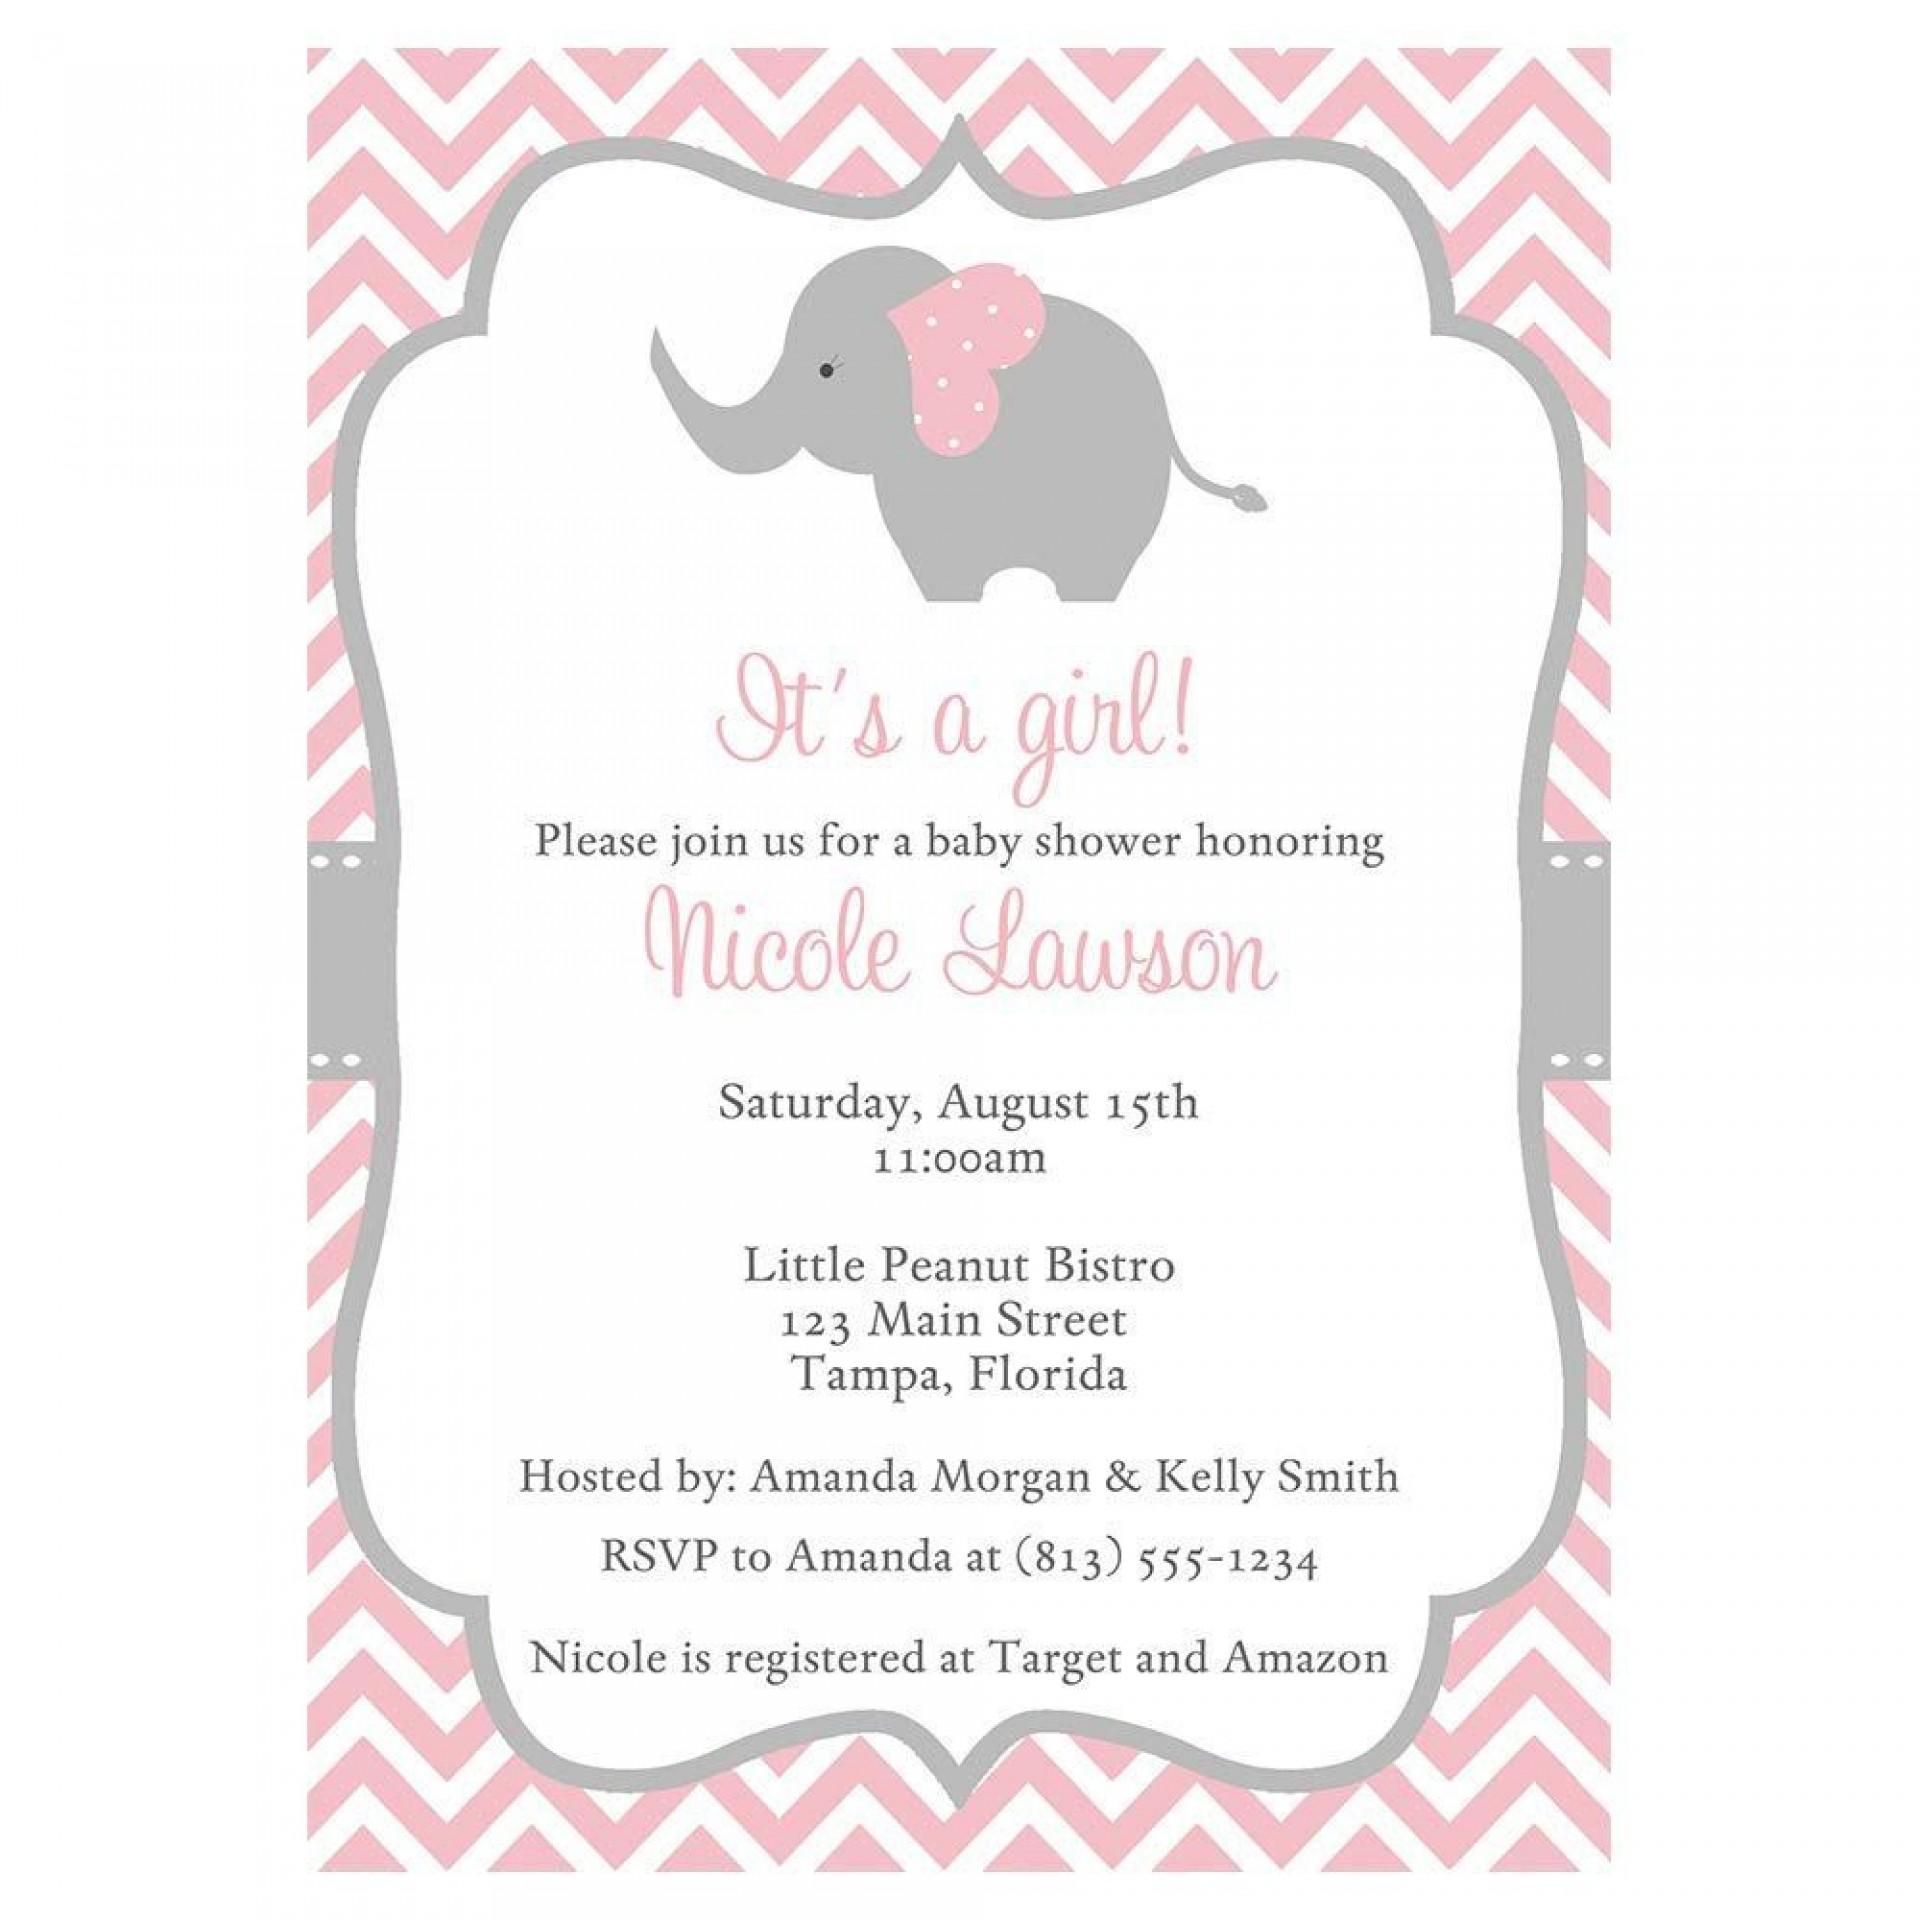 002 Phenomenal Baby Shower Invitation Girl Elephant Idea  Free Pink Template1920